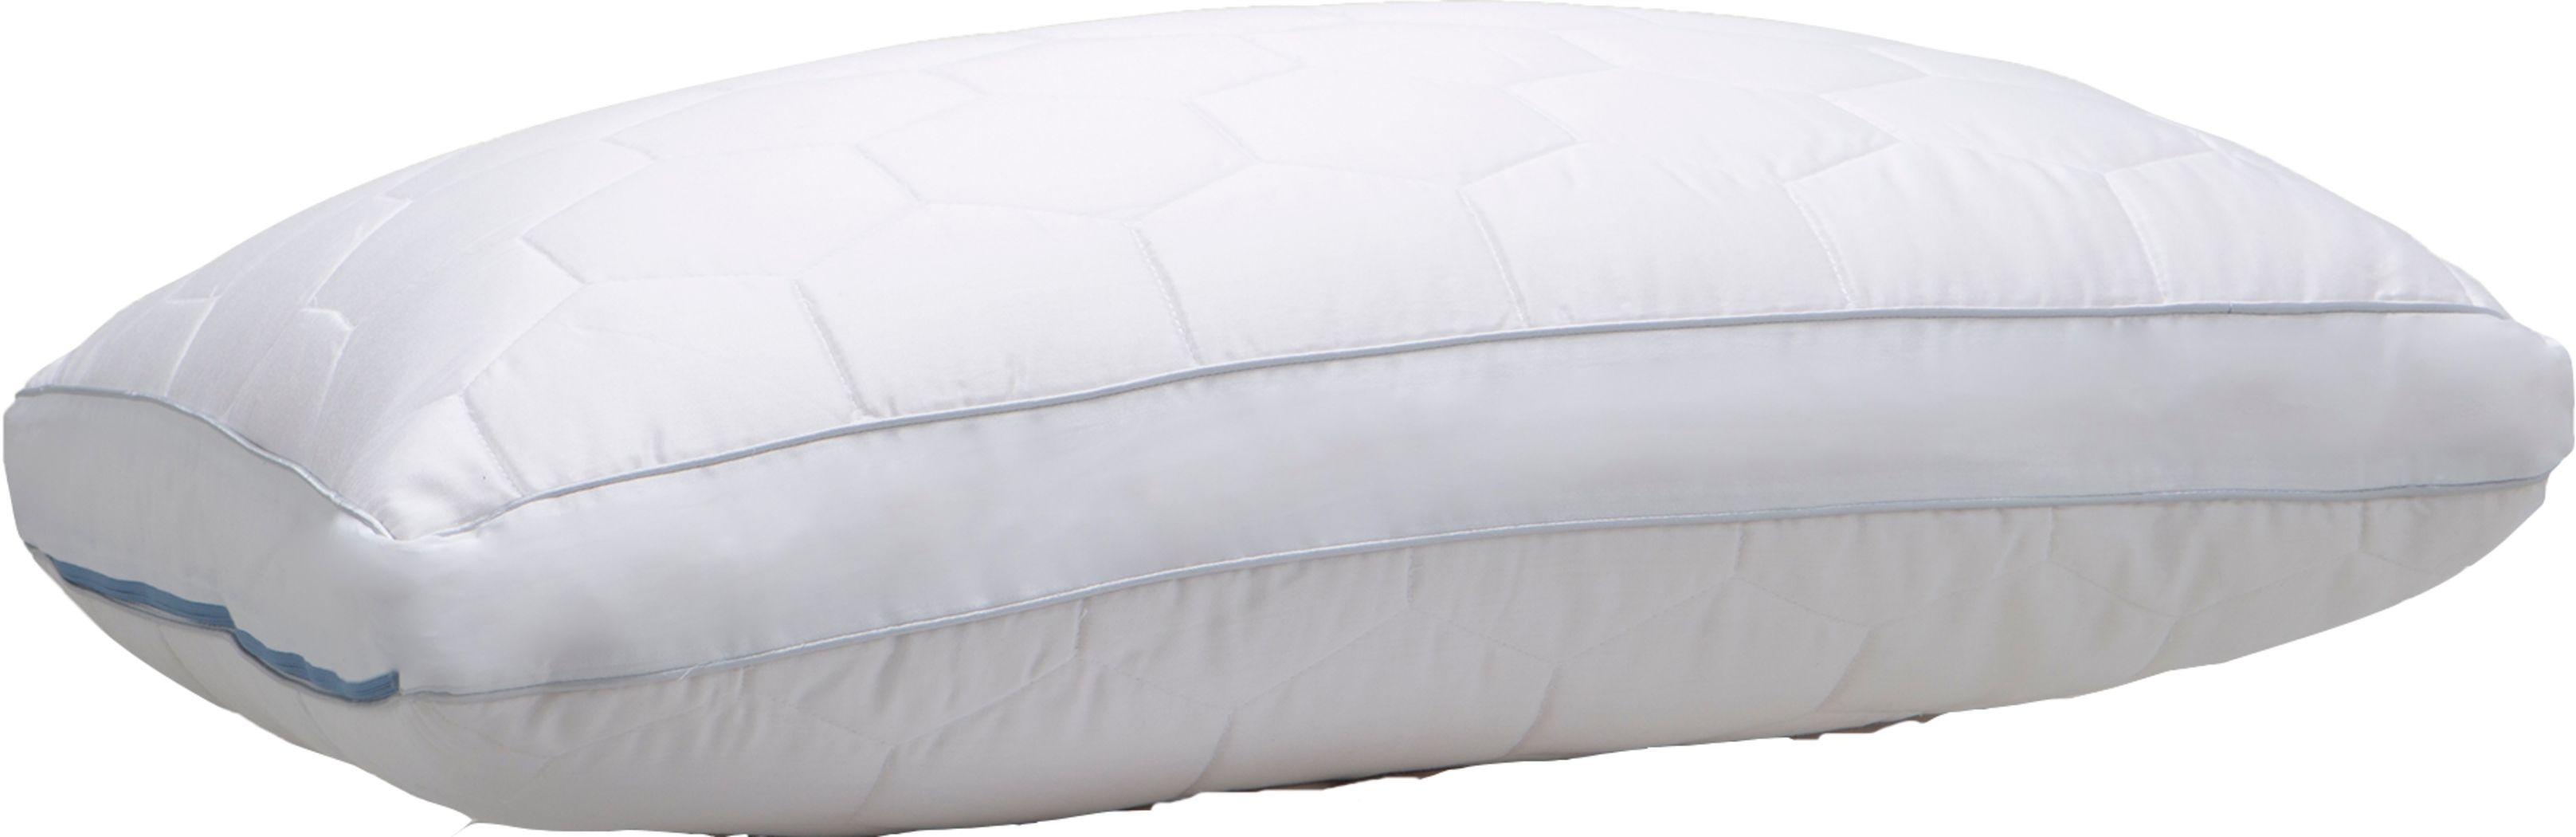 SHEEX Recovers Gen 2 King Down Alternative Side Sleeper Pillow